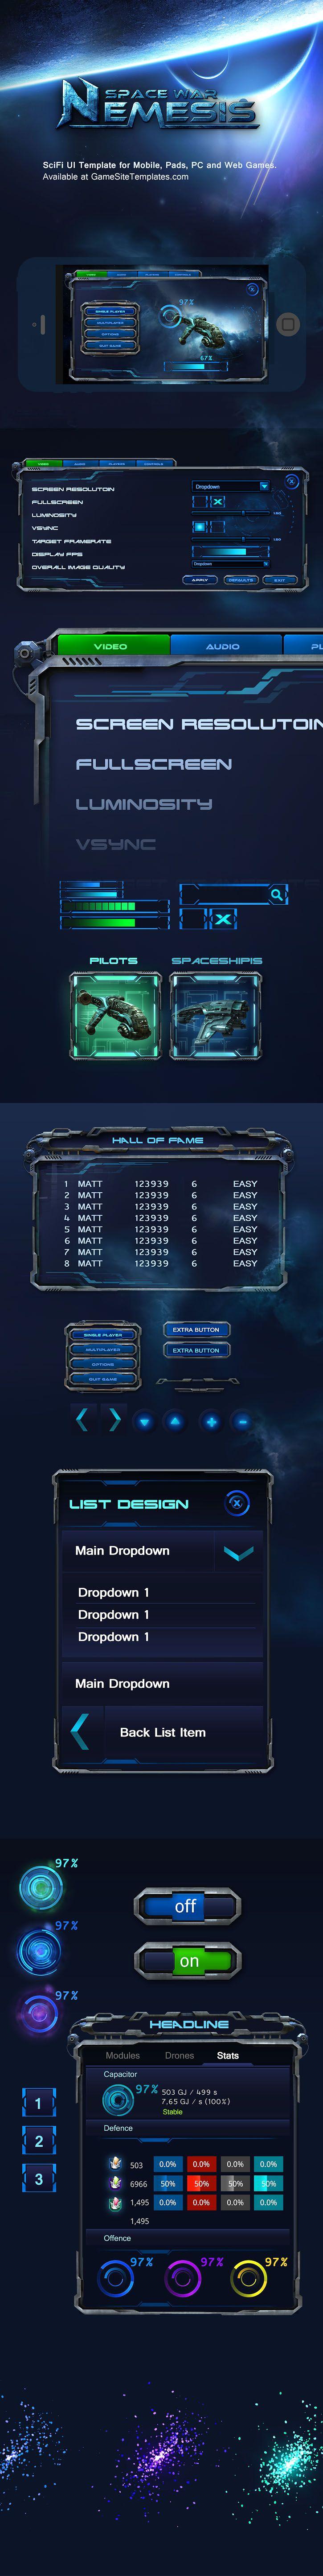 SpaceWar-SciFi-Mobile-Game-GUI-Interface-04 by karsten.deviantart.com on @deviantART